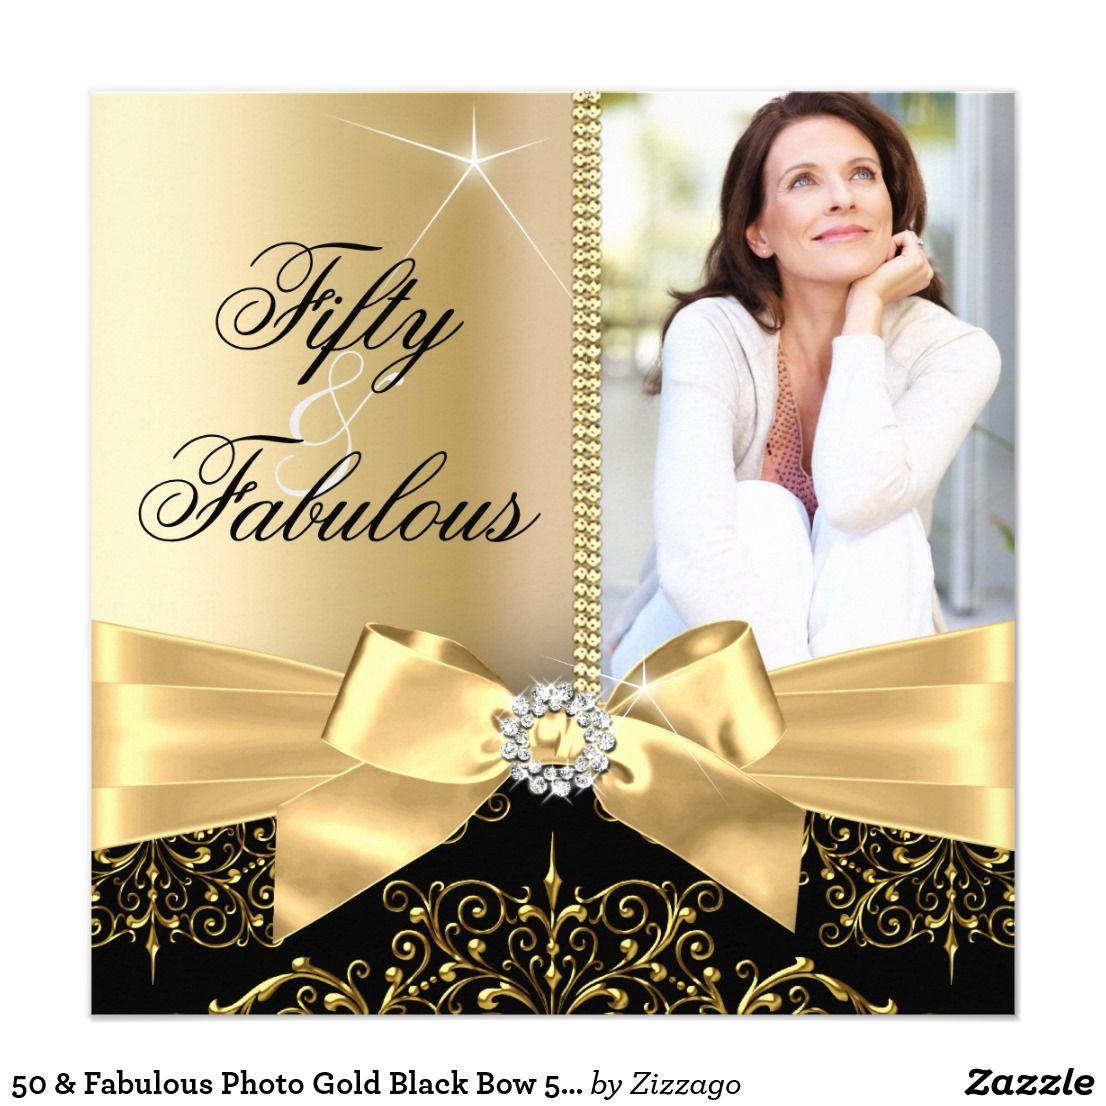 50 & Fabulous Photo Gold Black Bow 50th Birthday Invitation | Zazzle.com | 50th  birthday invitations, 50th birthday party invitations, Elegant birthday  party